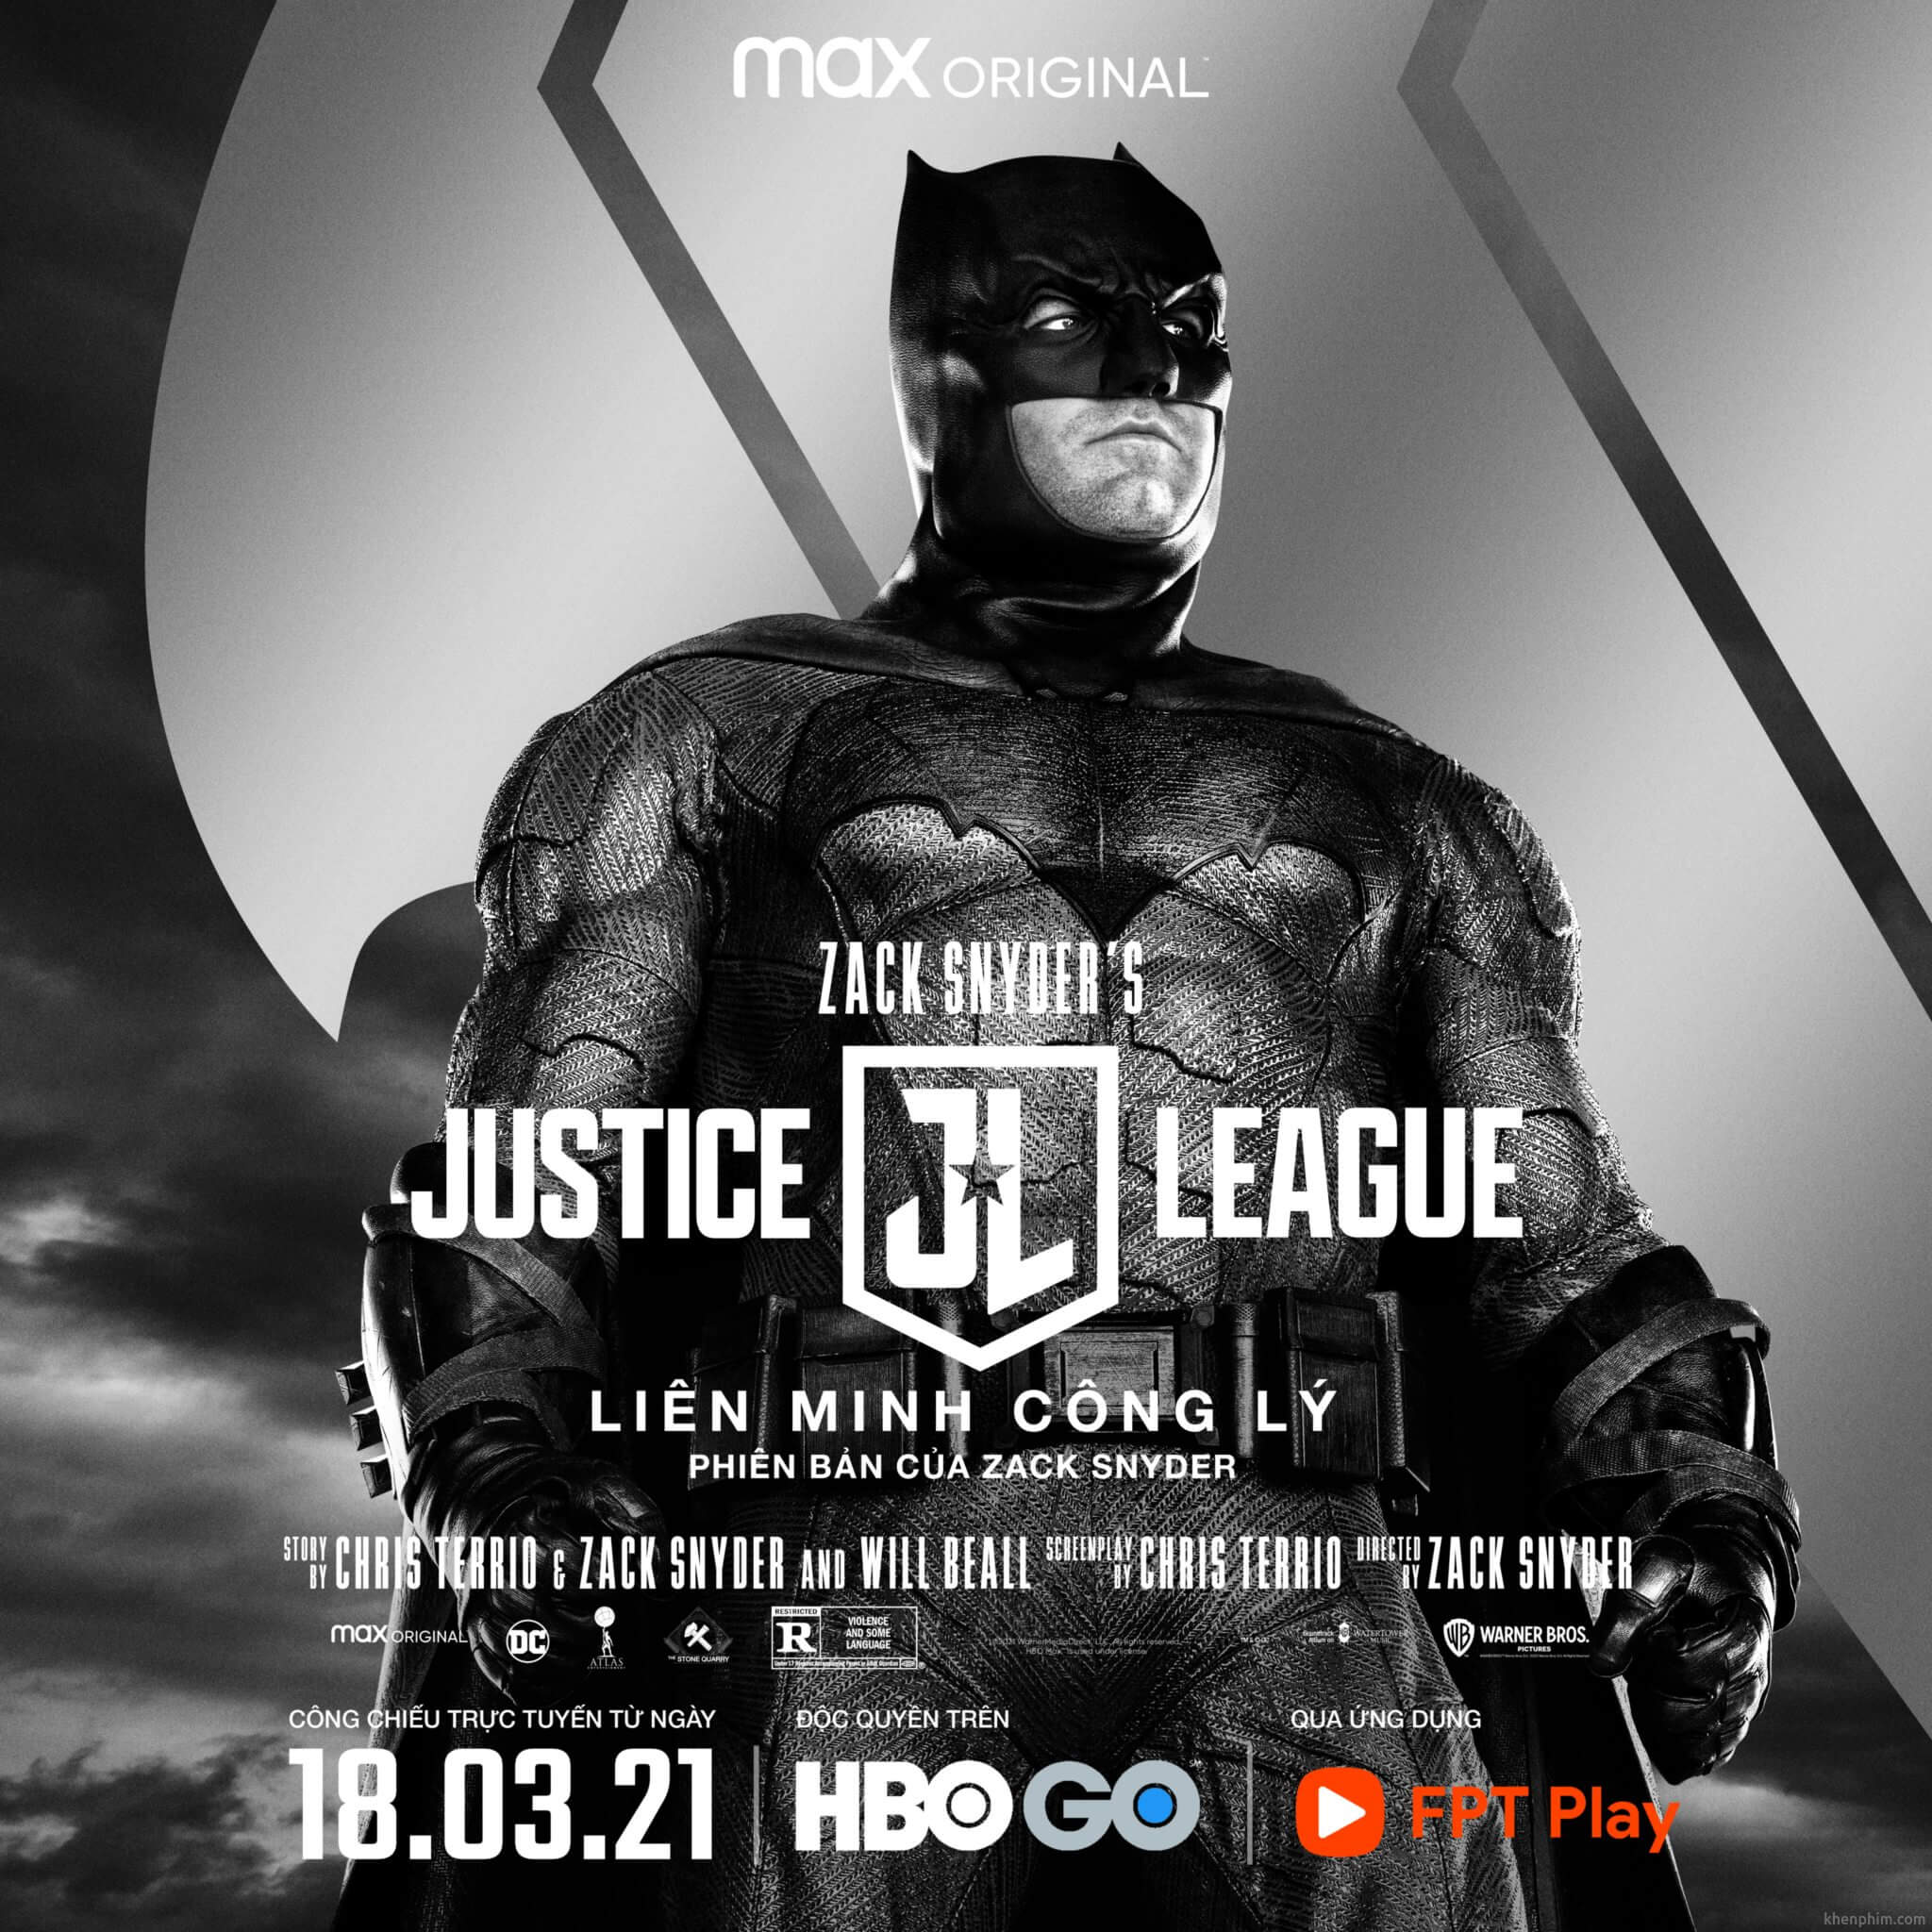 Poster nhân vật trong phim Zack Snyder's Justice League - Batman